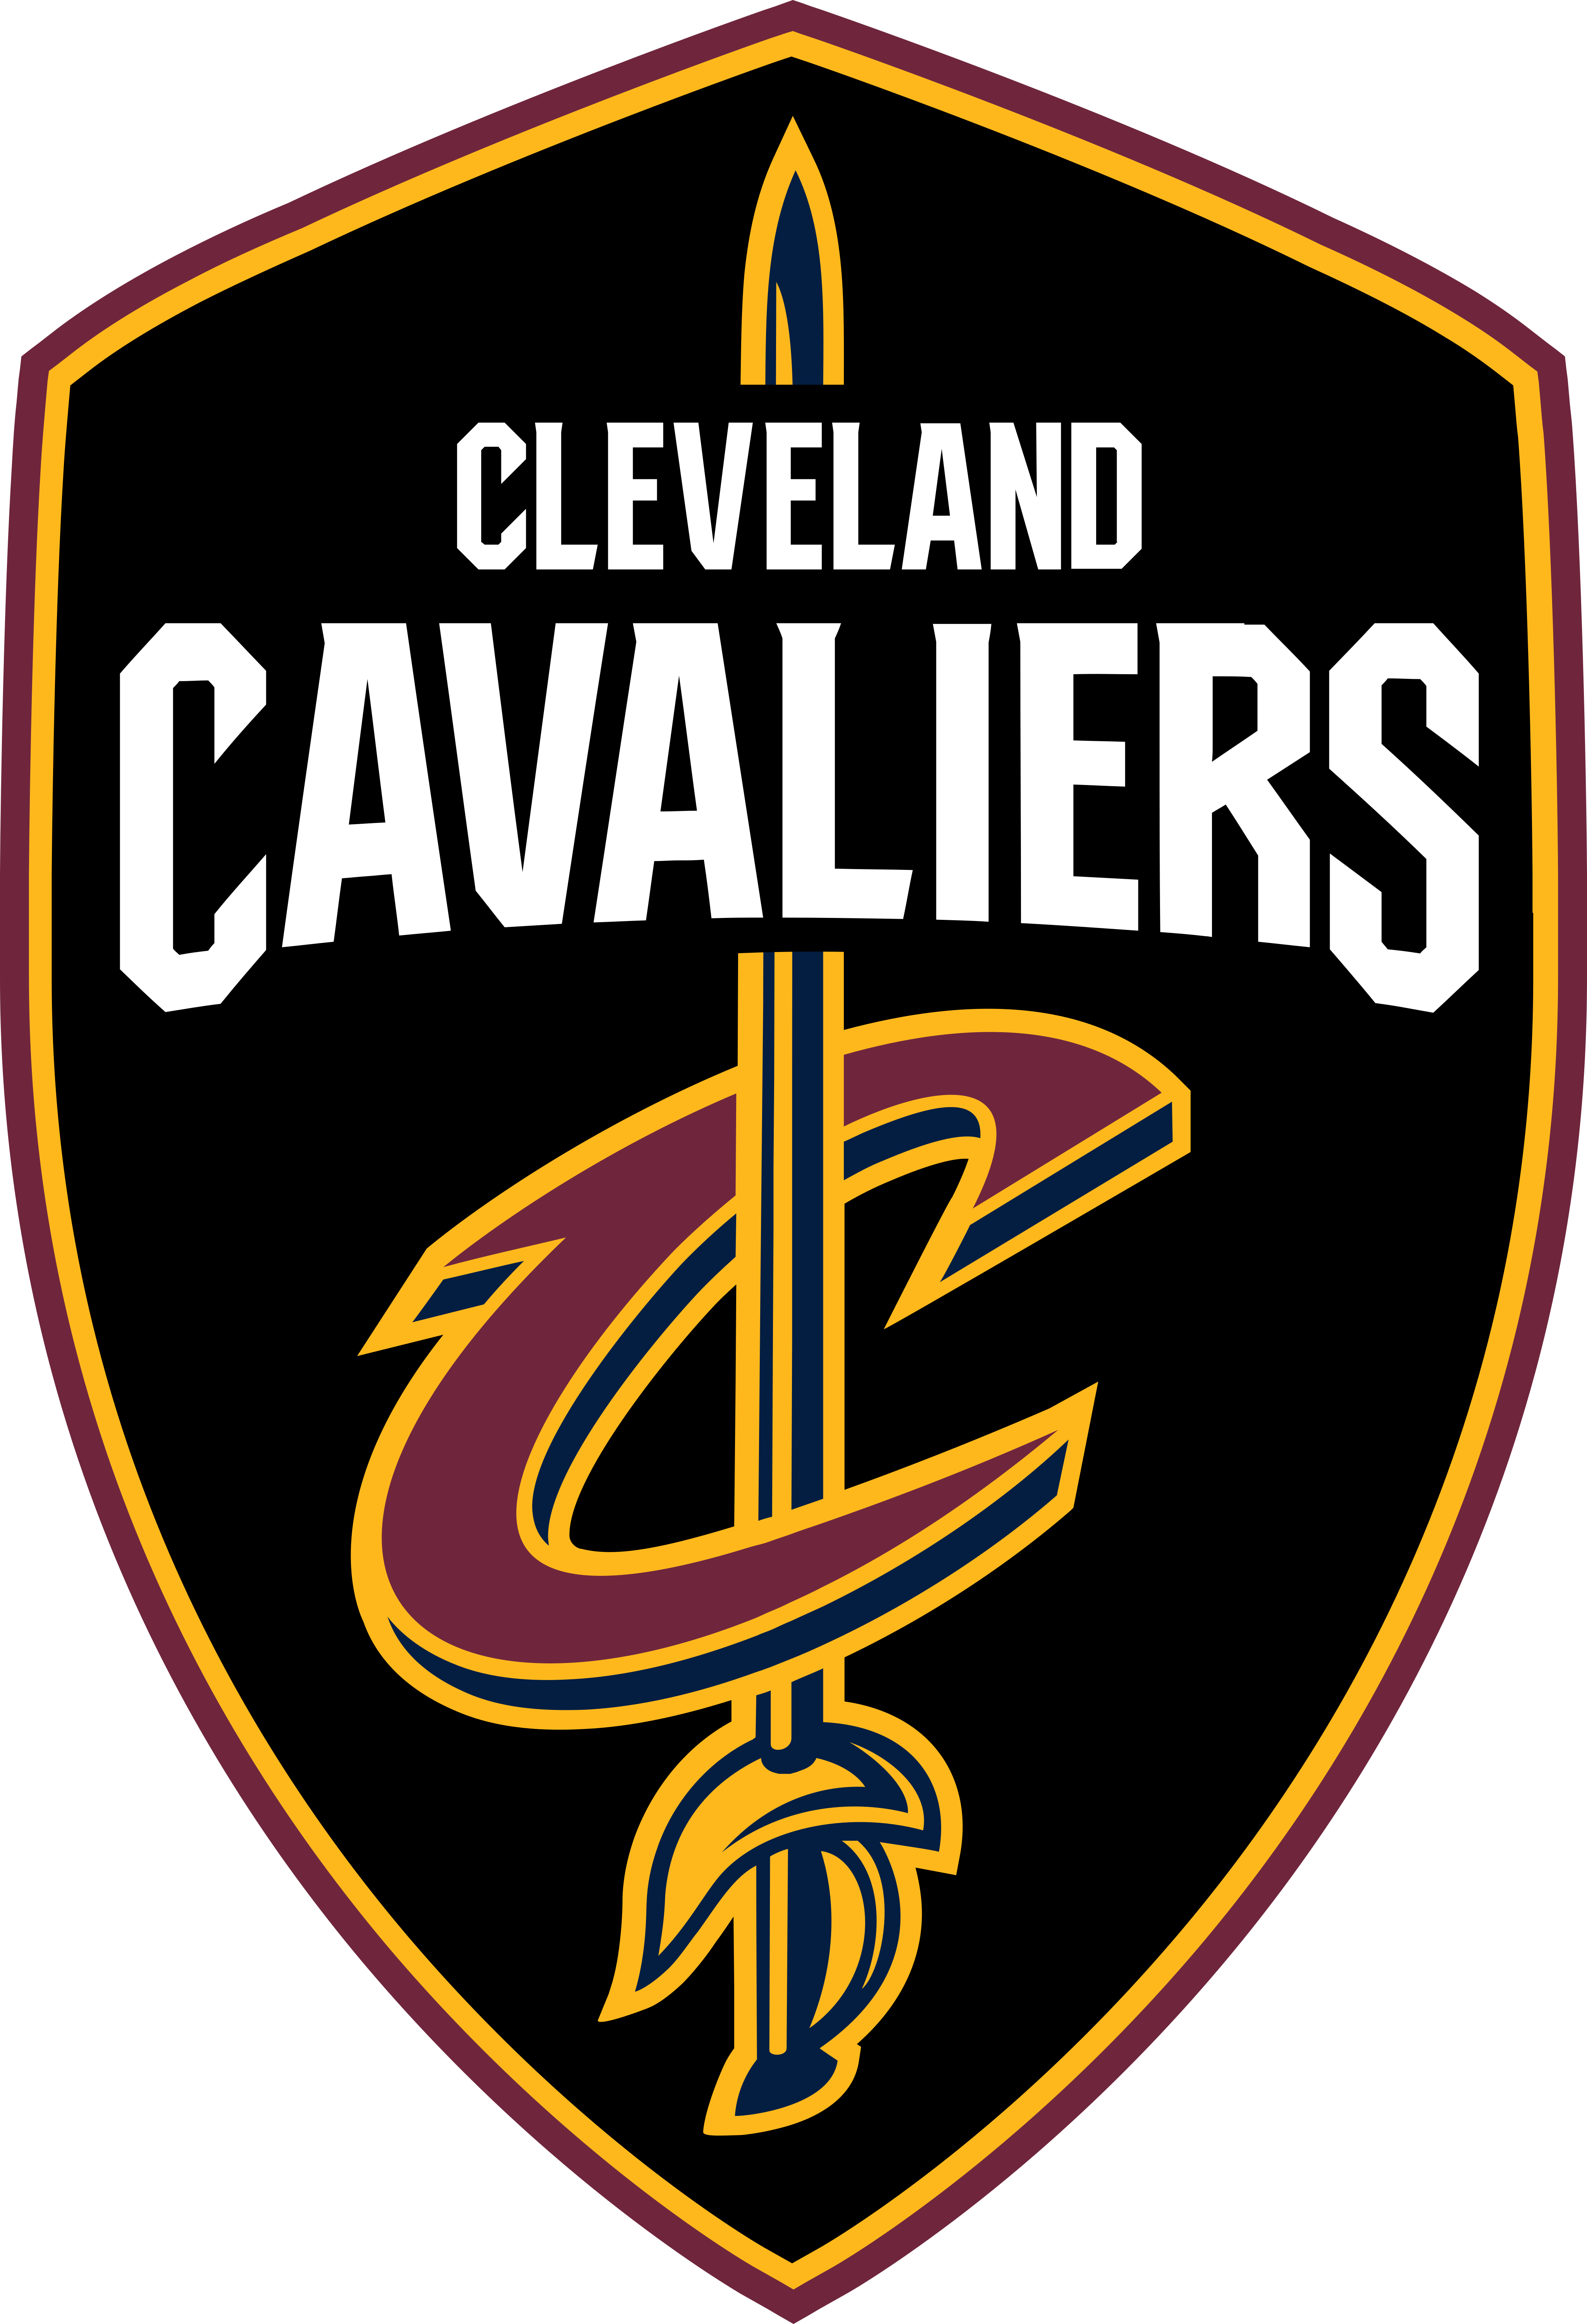 cleveland cavaliers logo 3 - Cleveland Cavaliers Logo